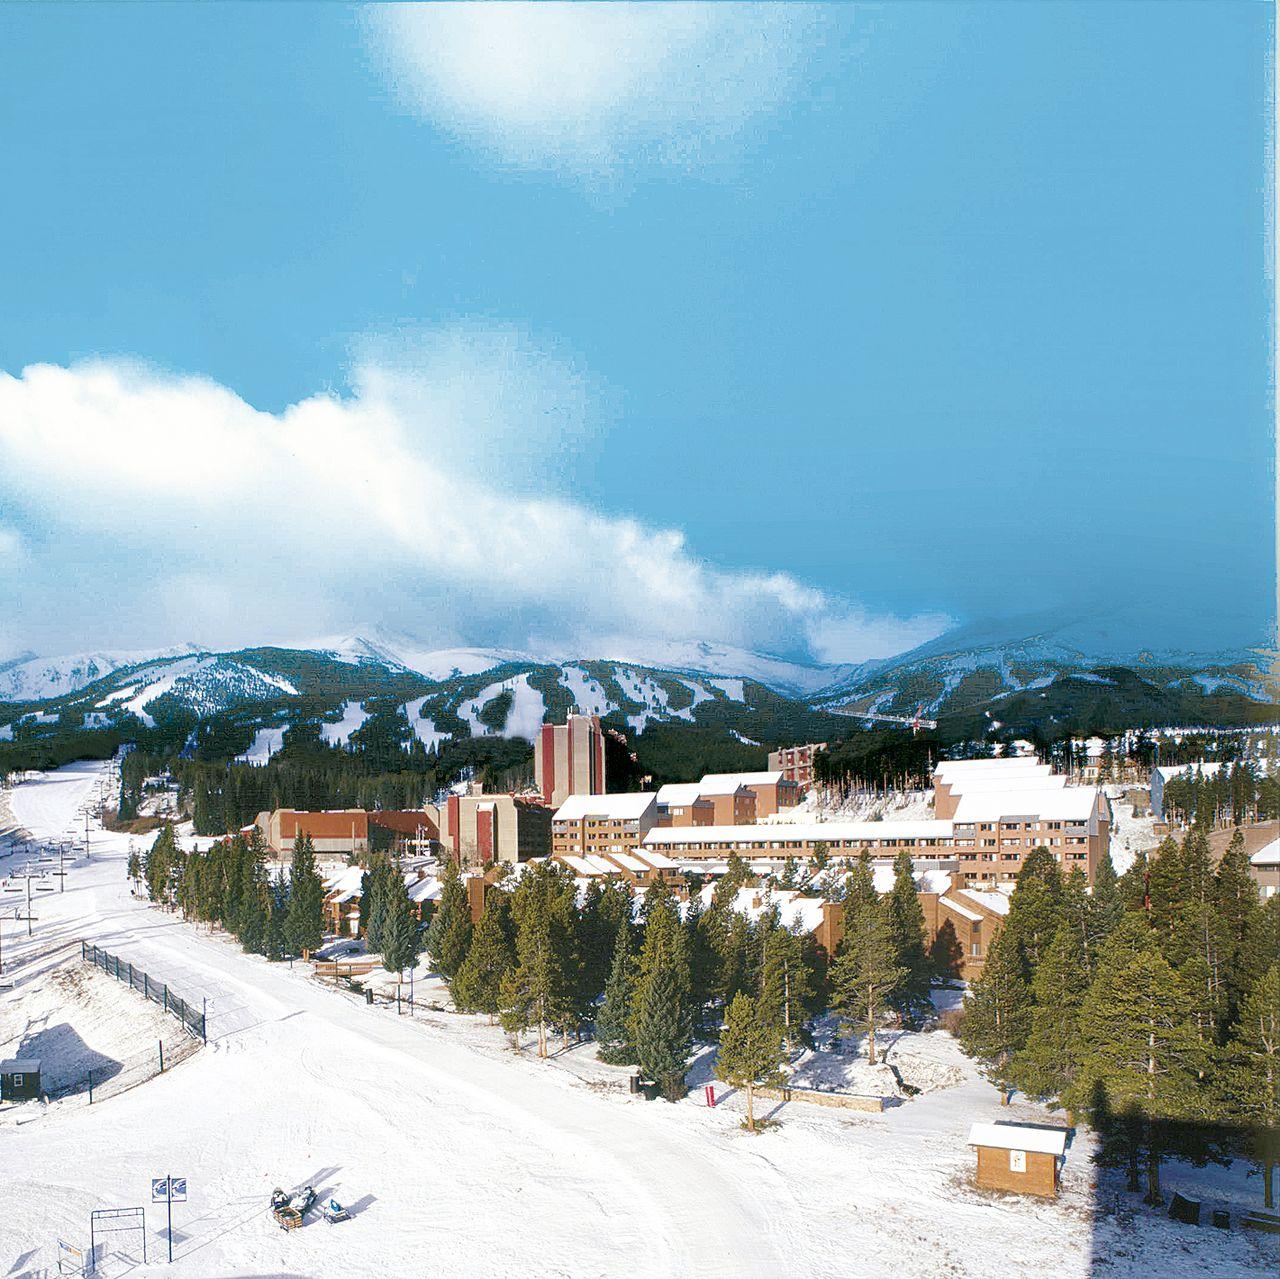 Hilton Hotels Colorado Ski Resorts